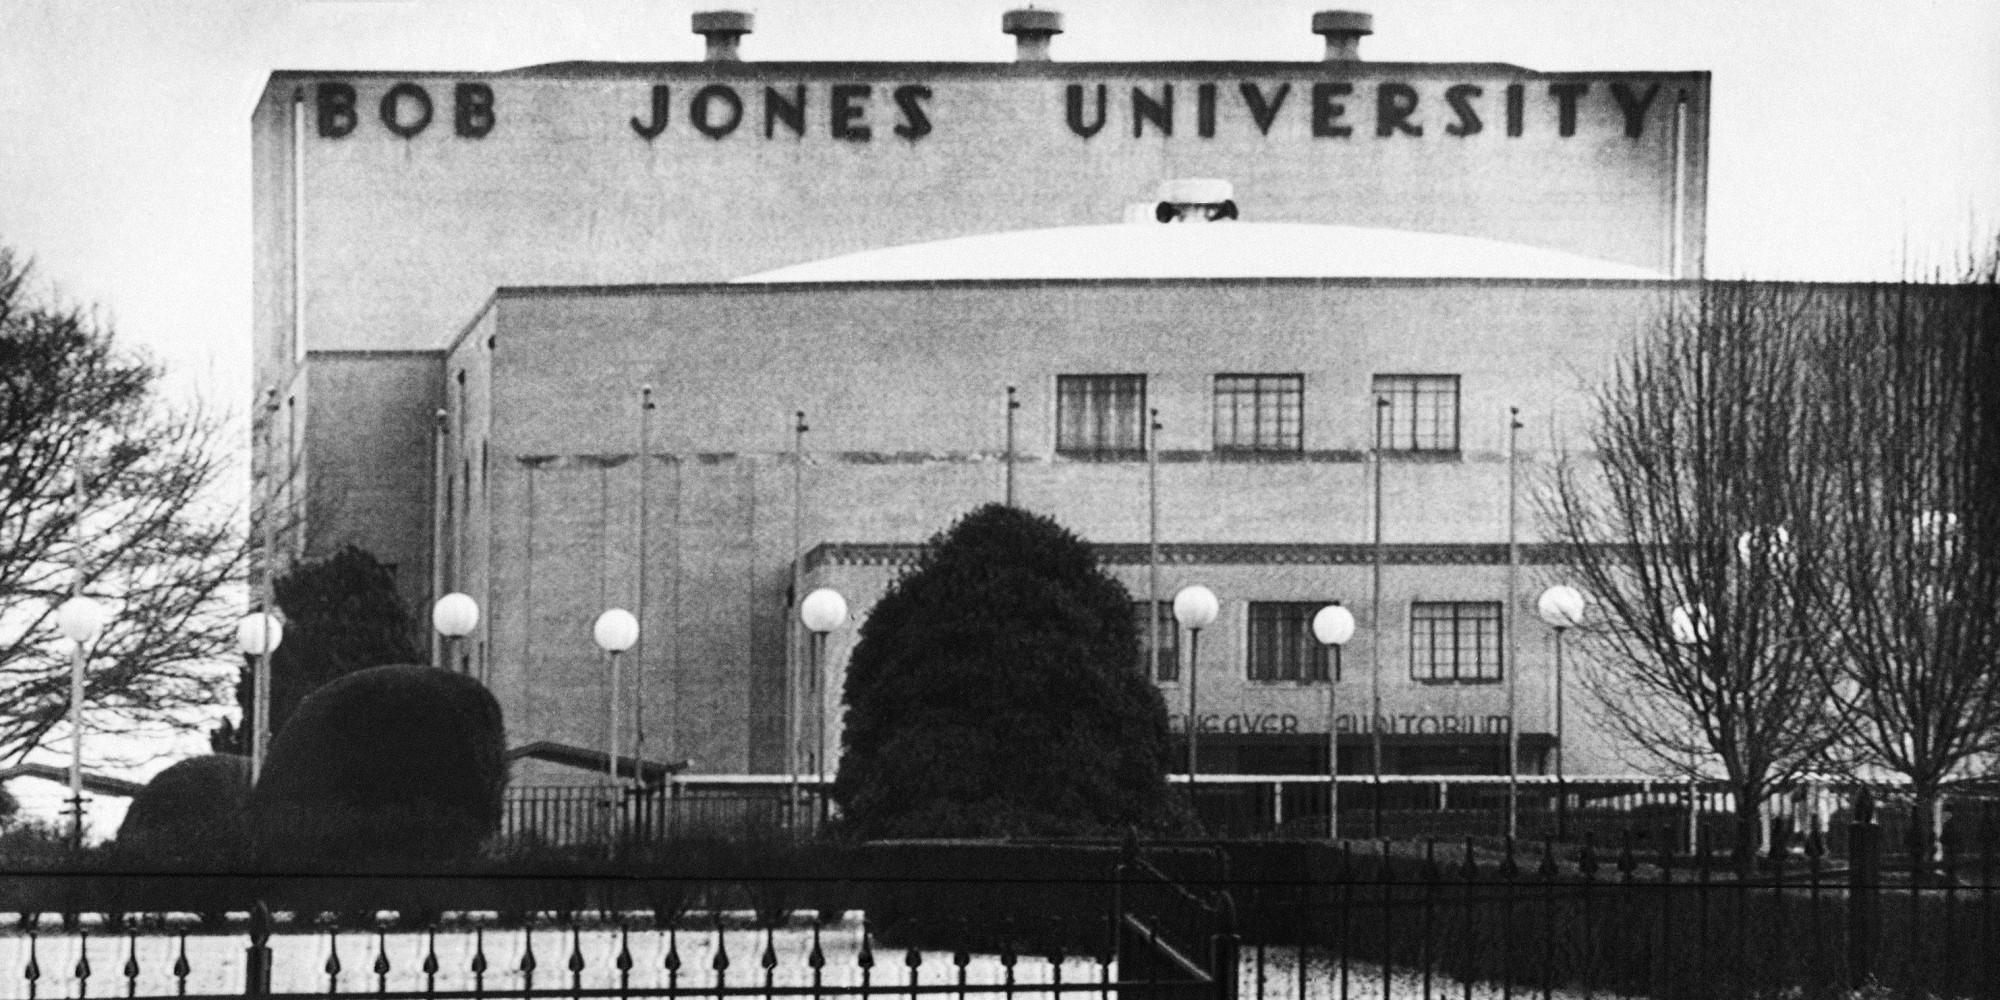 Bob Jones University School of Business Administration Full Time MBA